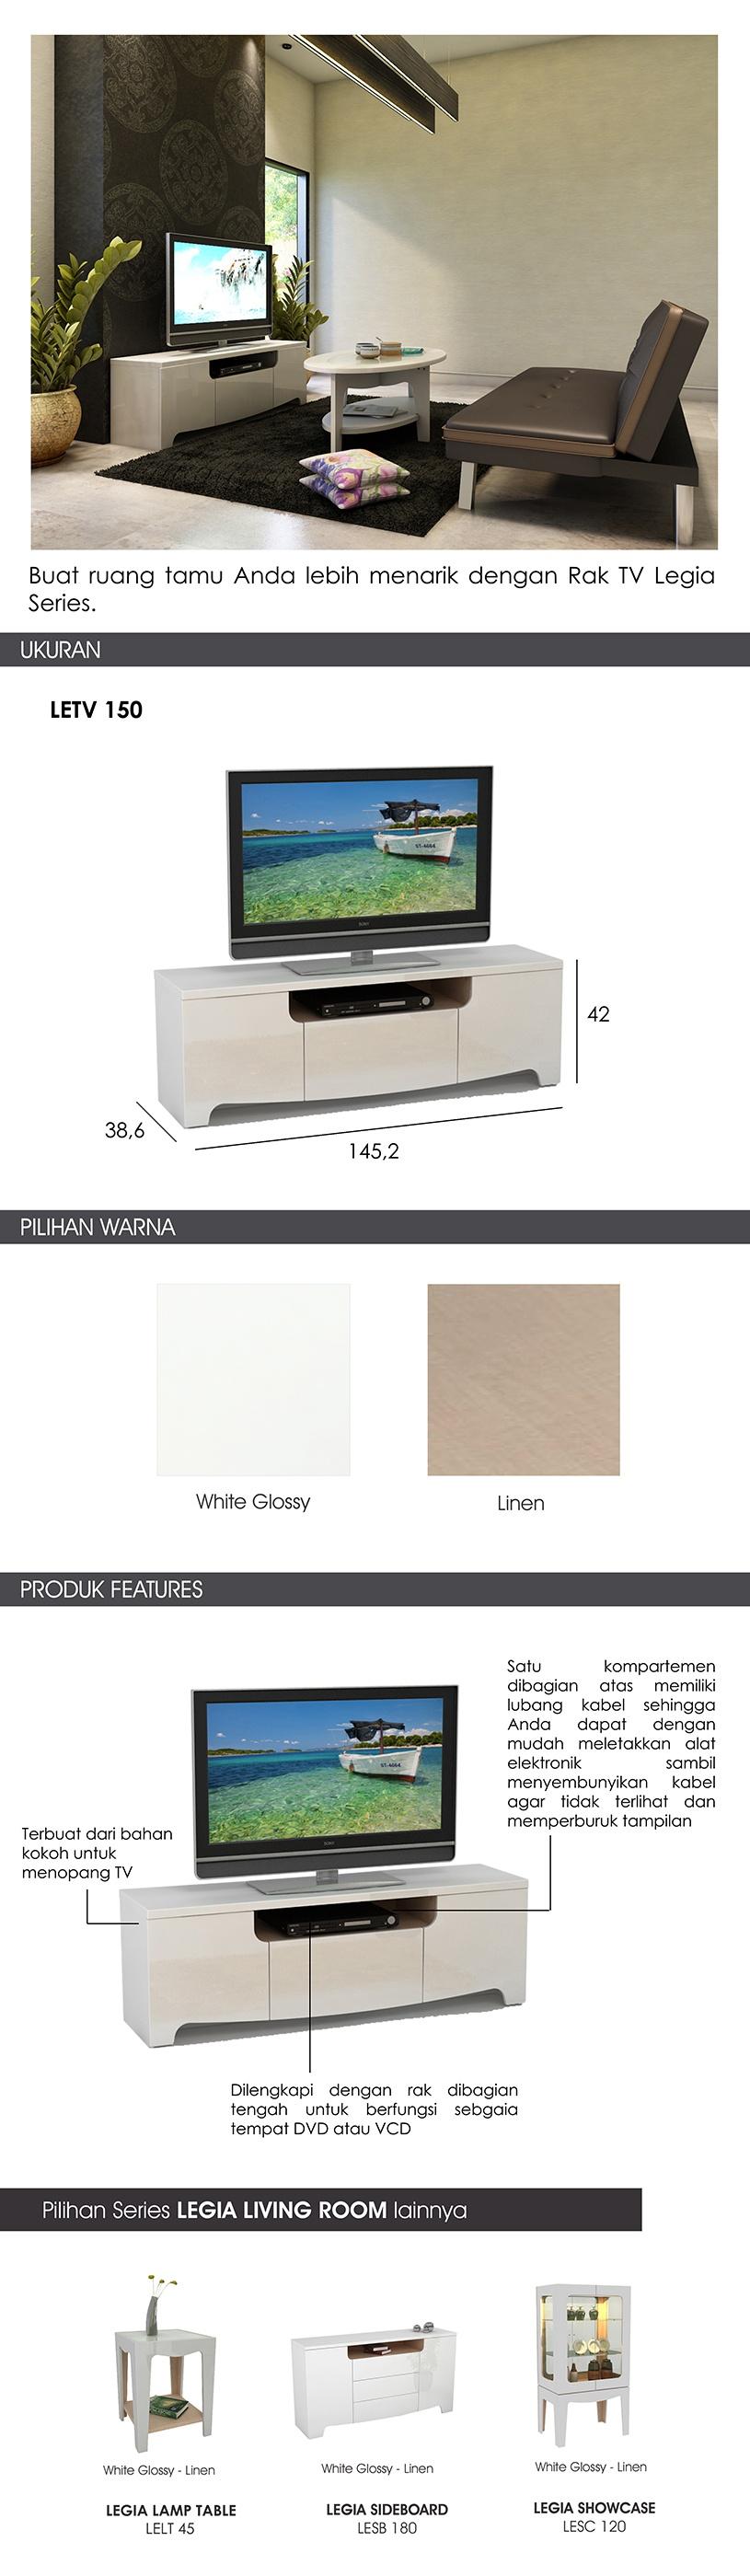 Harga Pro Design Legia Rak Tv White Glossy Linen Khusus Jawa Bali Brico Sanremo Dark Black Image